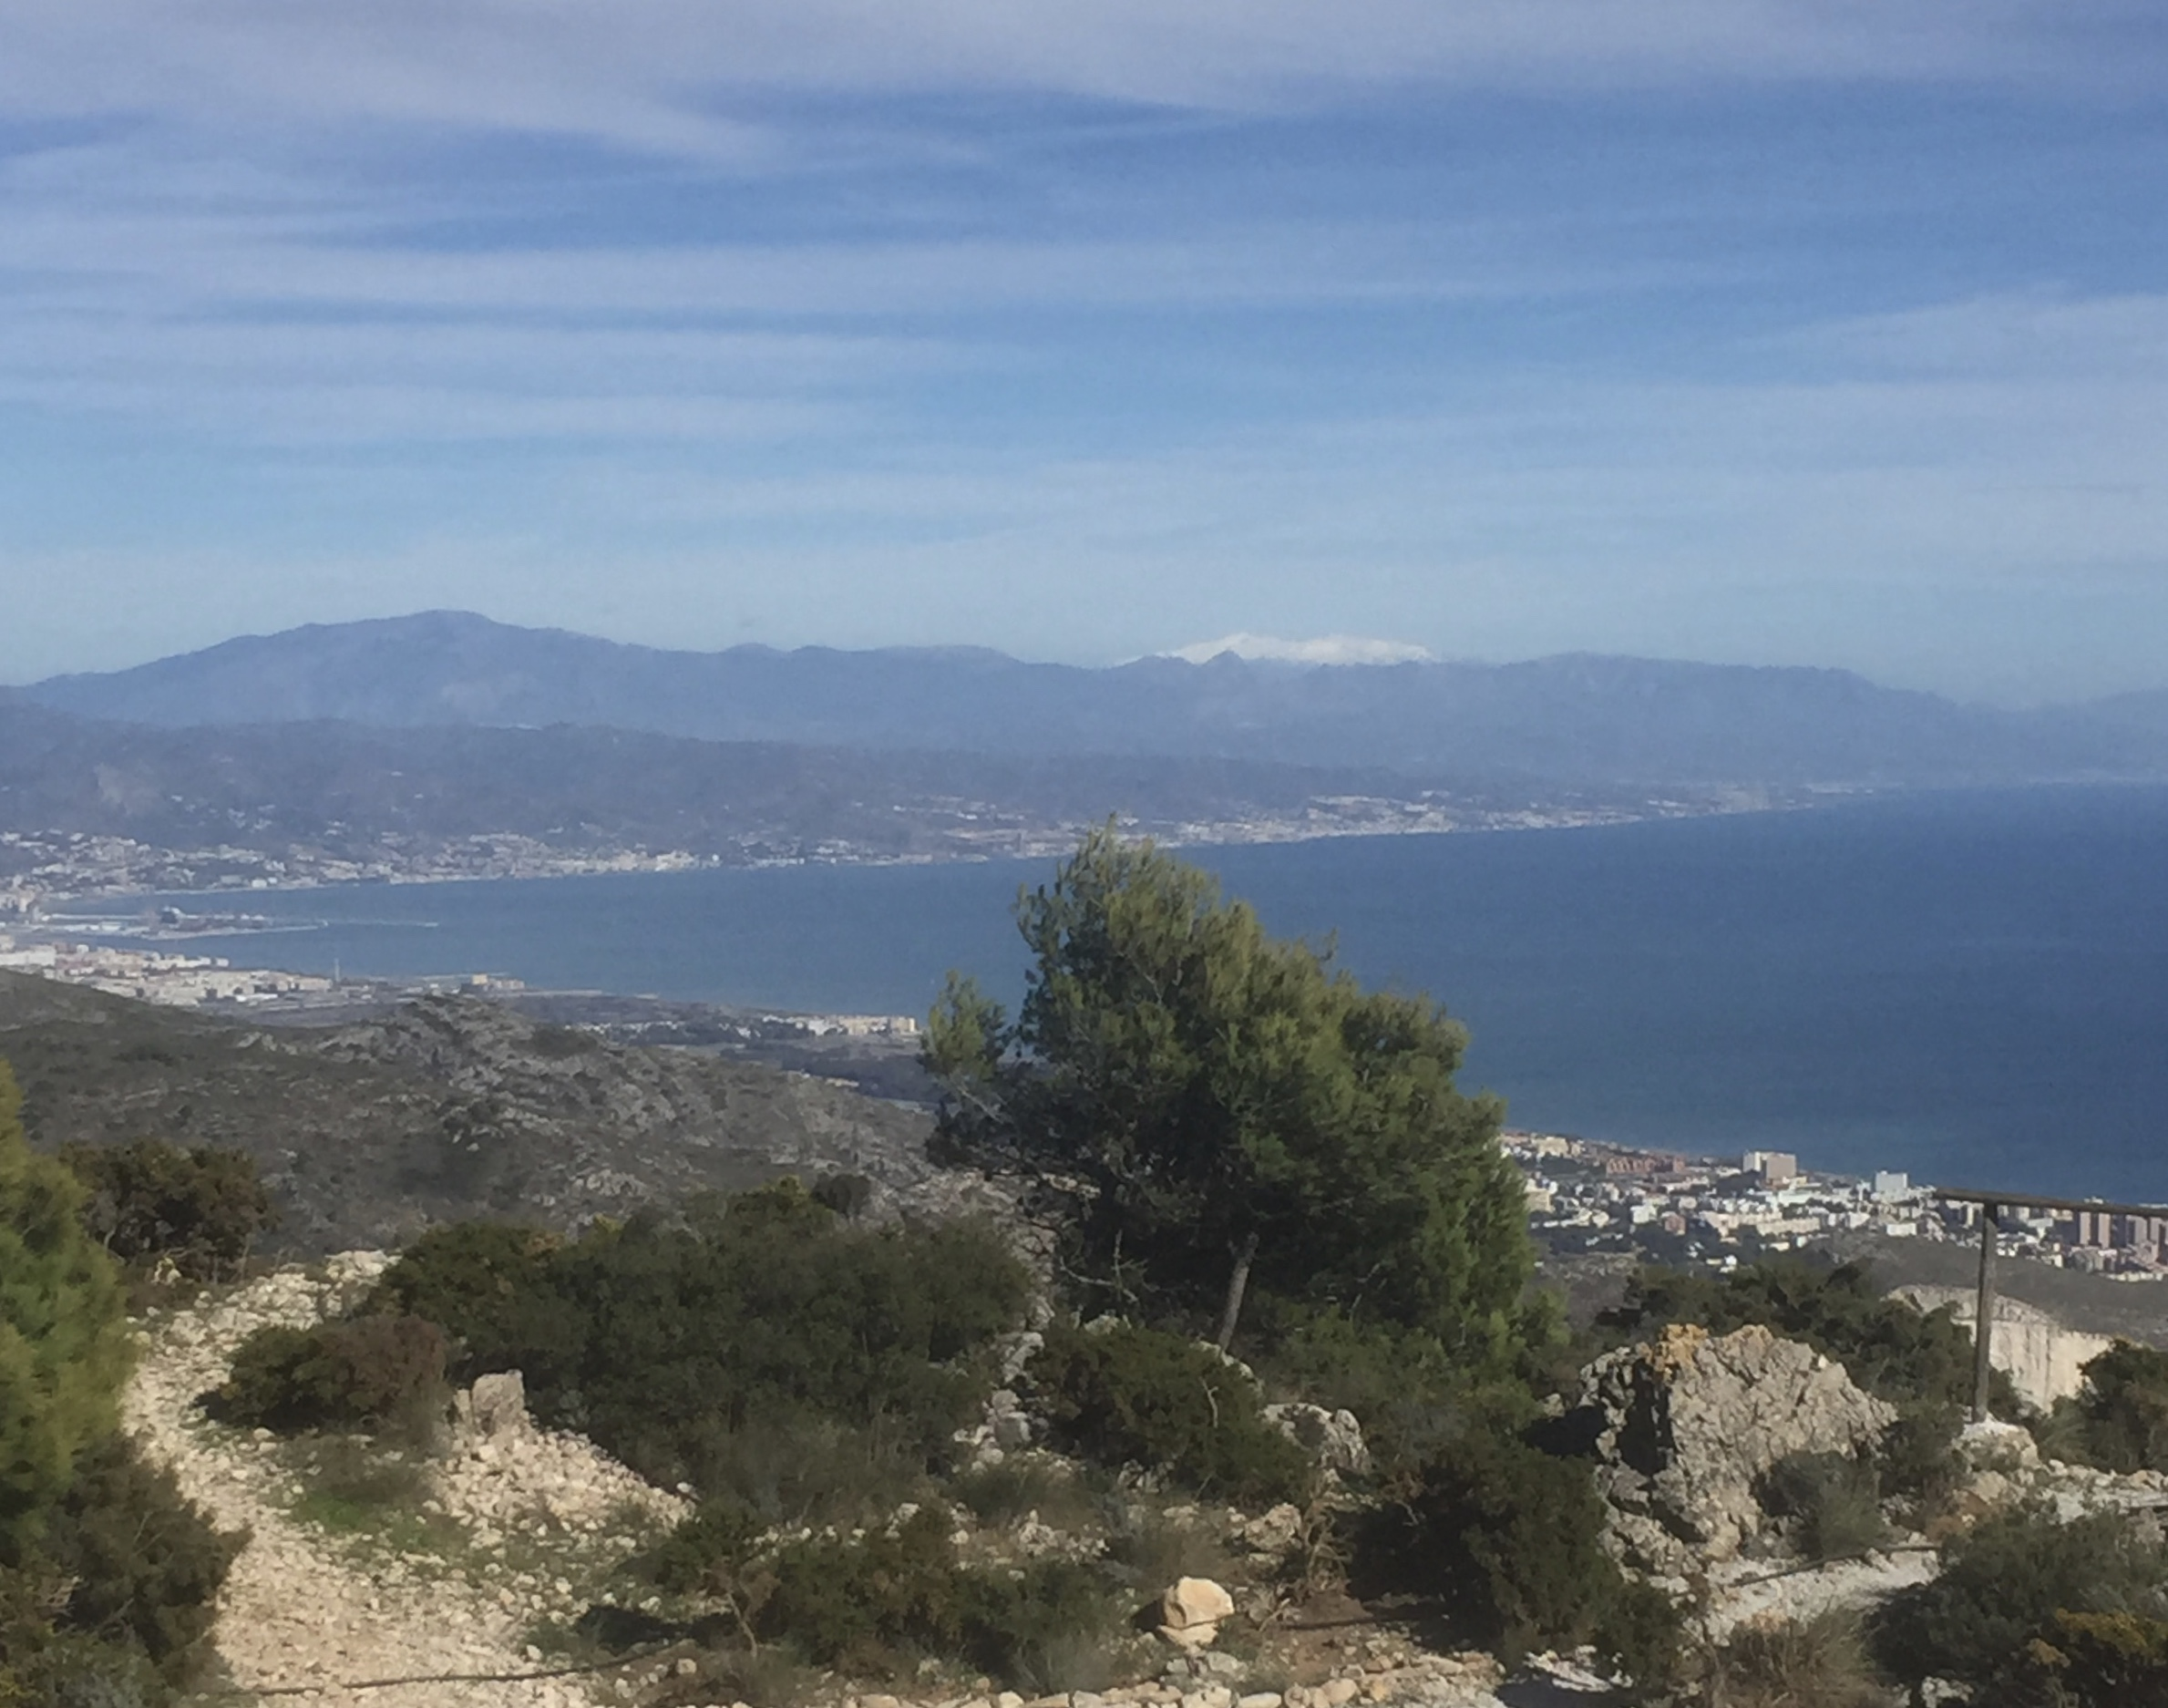 Vue du sommet vers Malaga et la Sierra Nevada